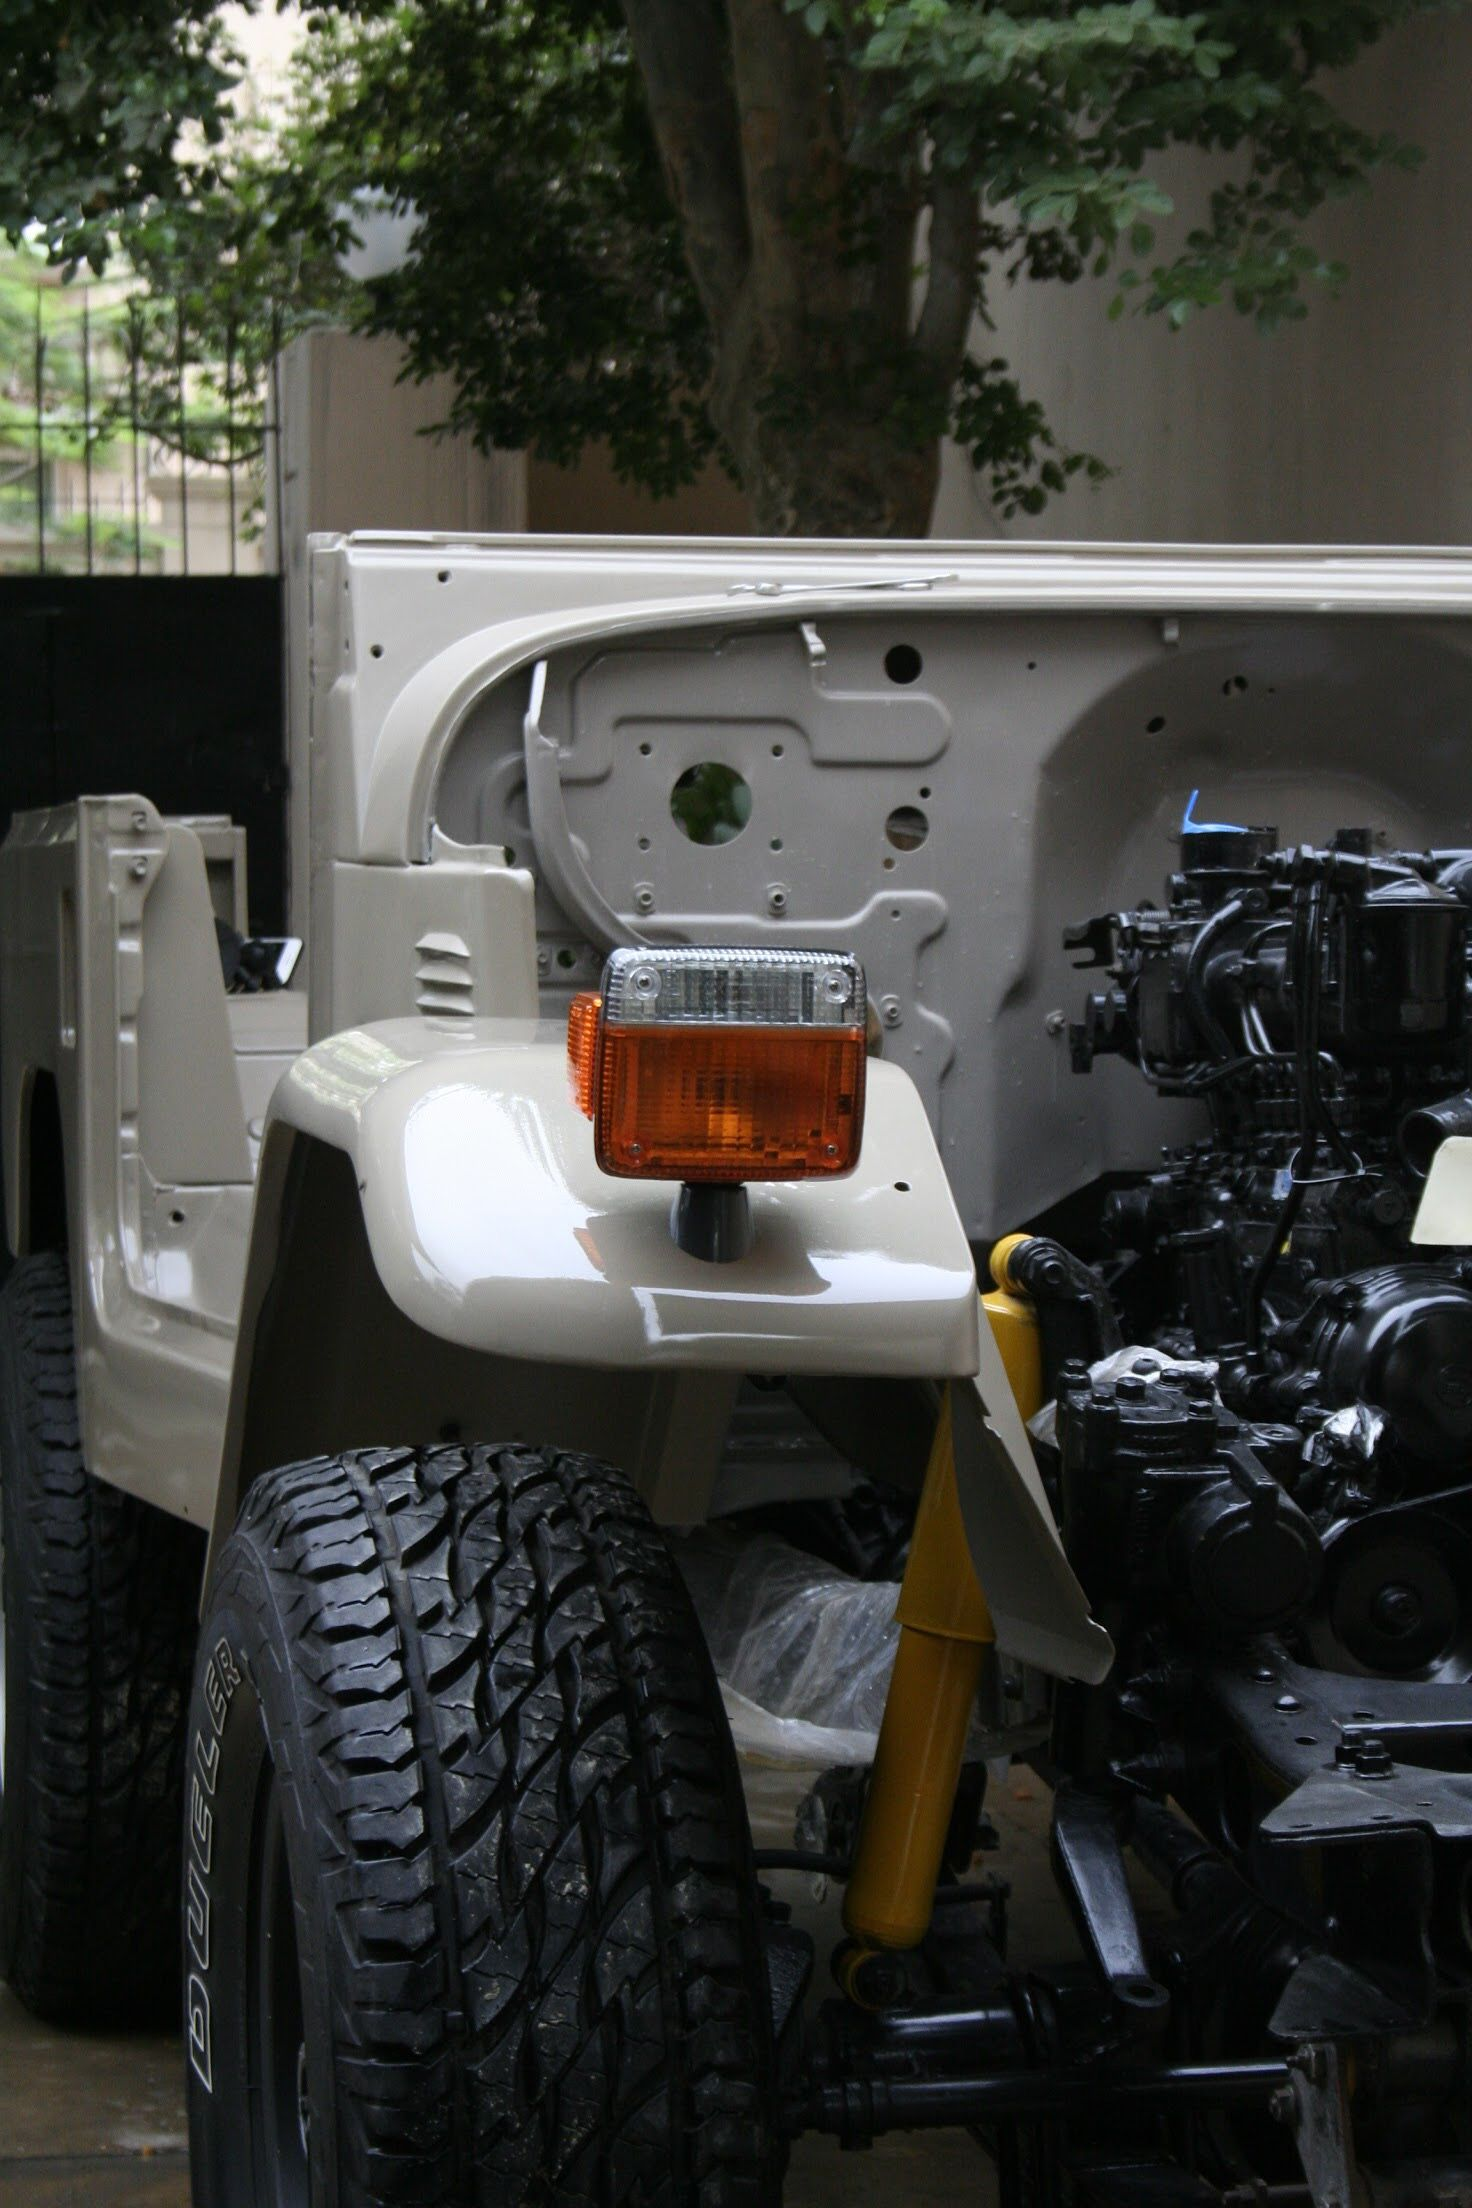 FJ40 restoration by Kaizr Cruiser | Restorations by Kaizr Cruiser